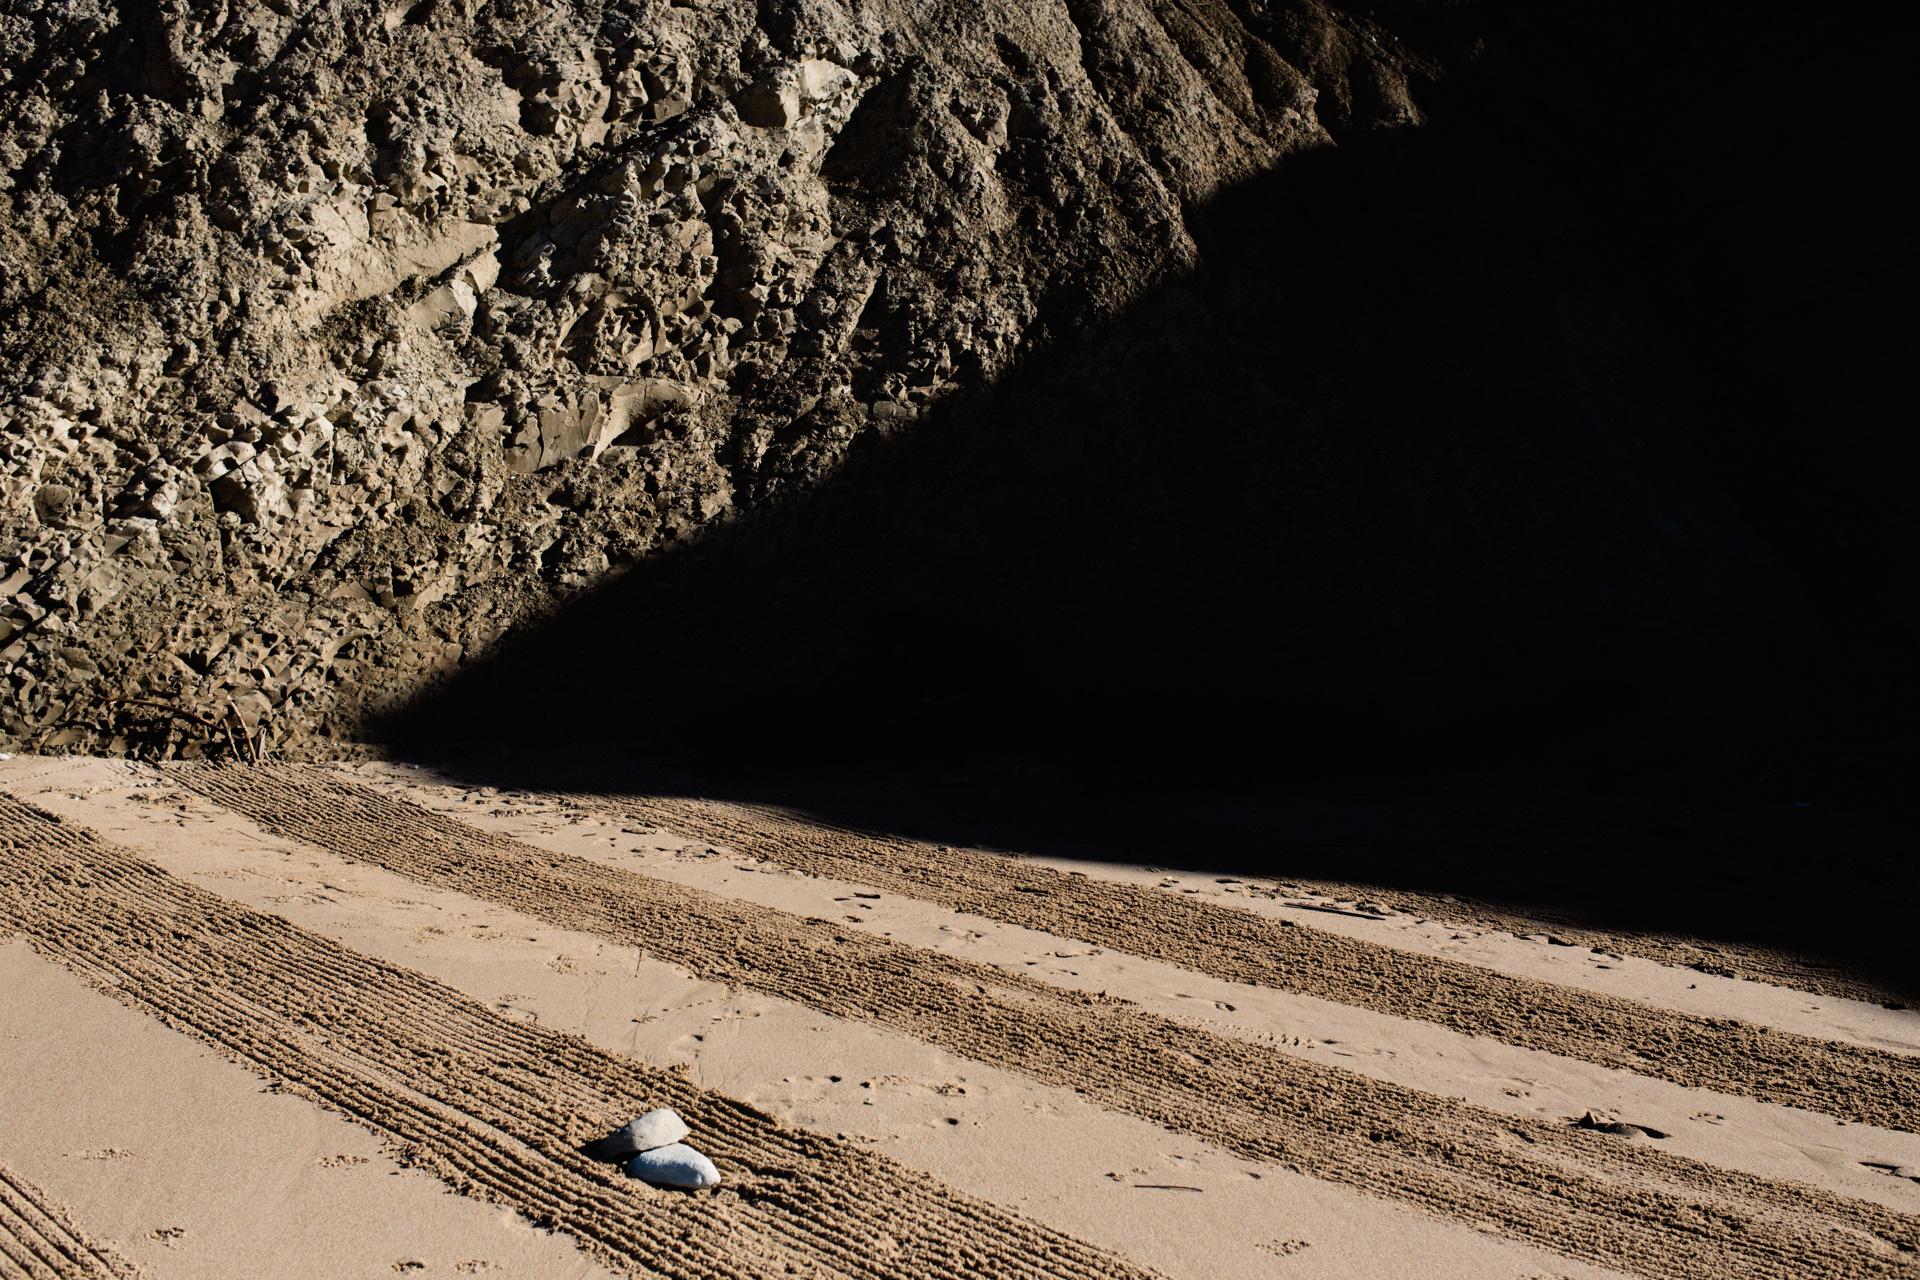 Damien-dohmen-sand-print-lx-one-27